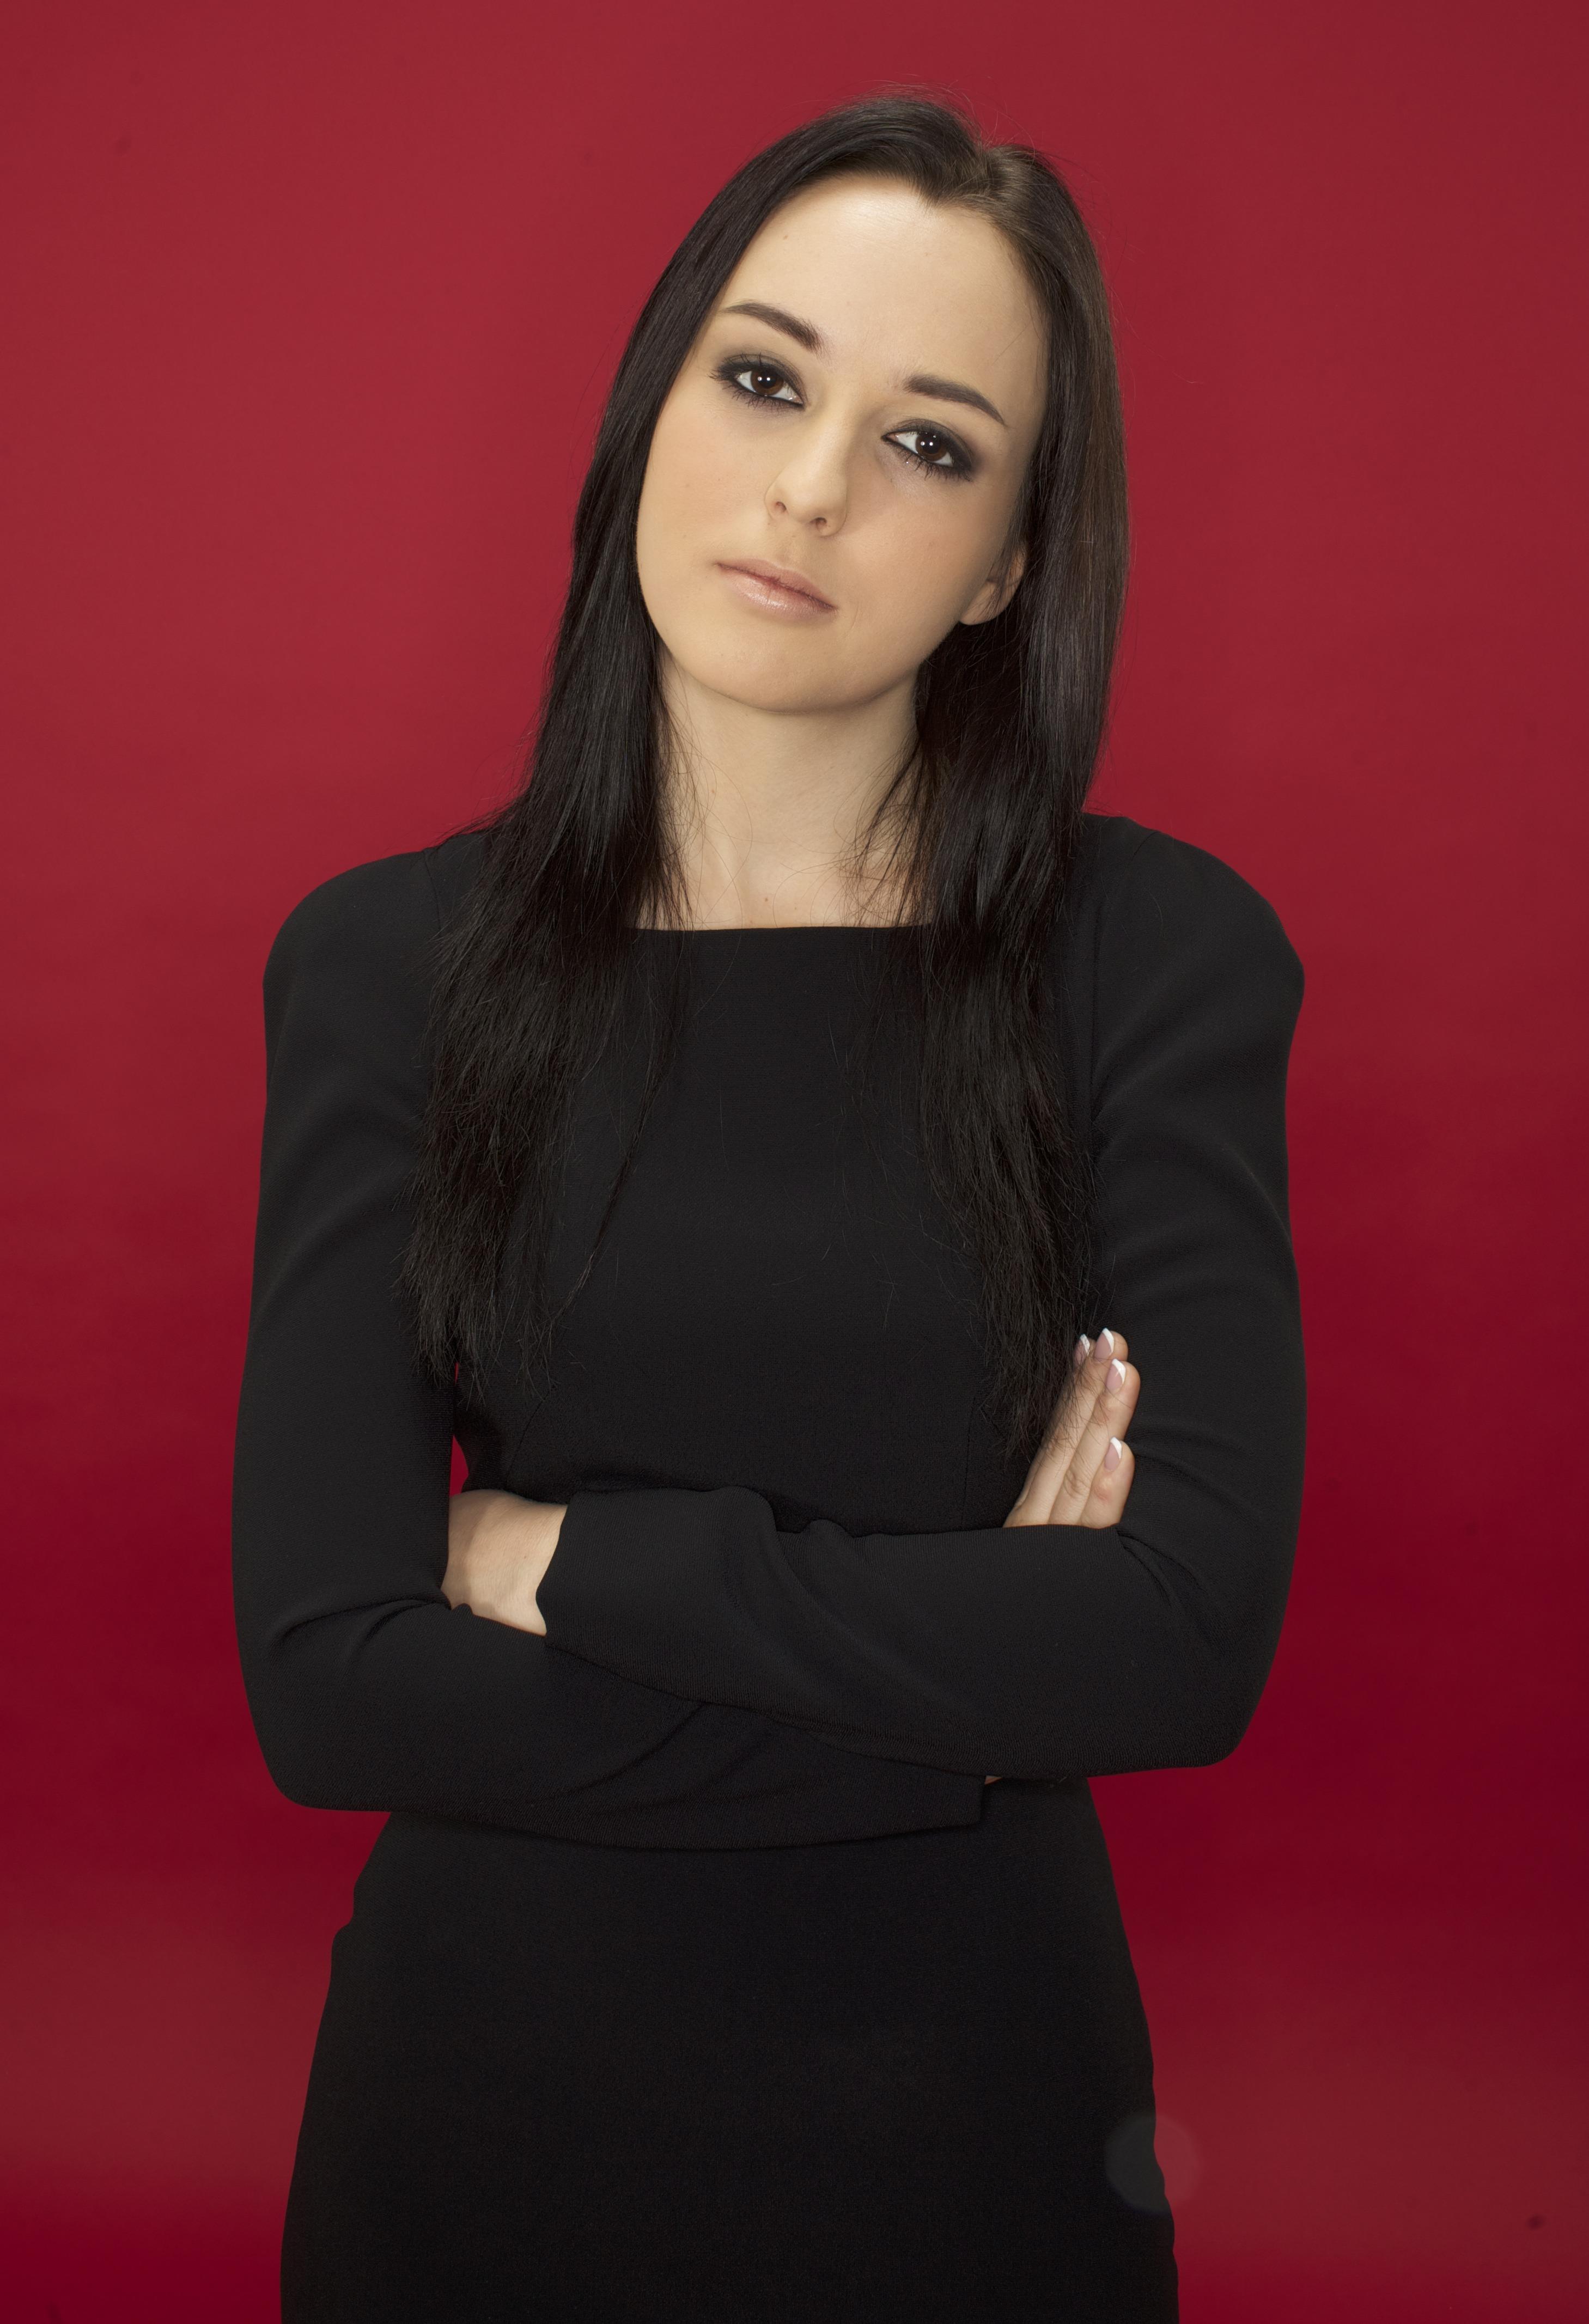 Anna Veduta